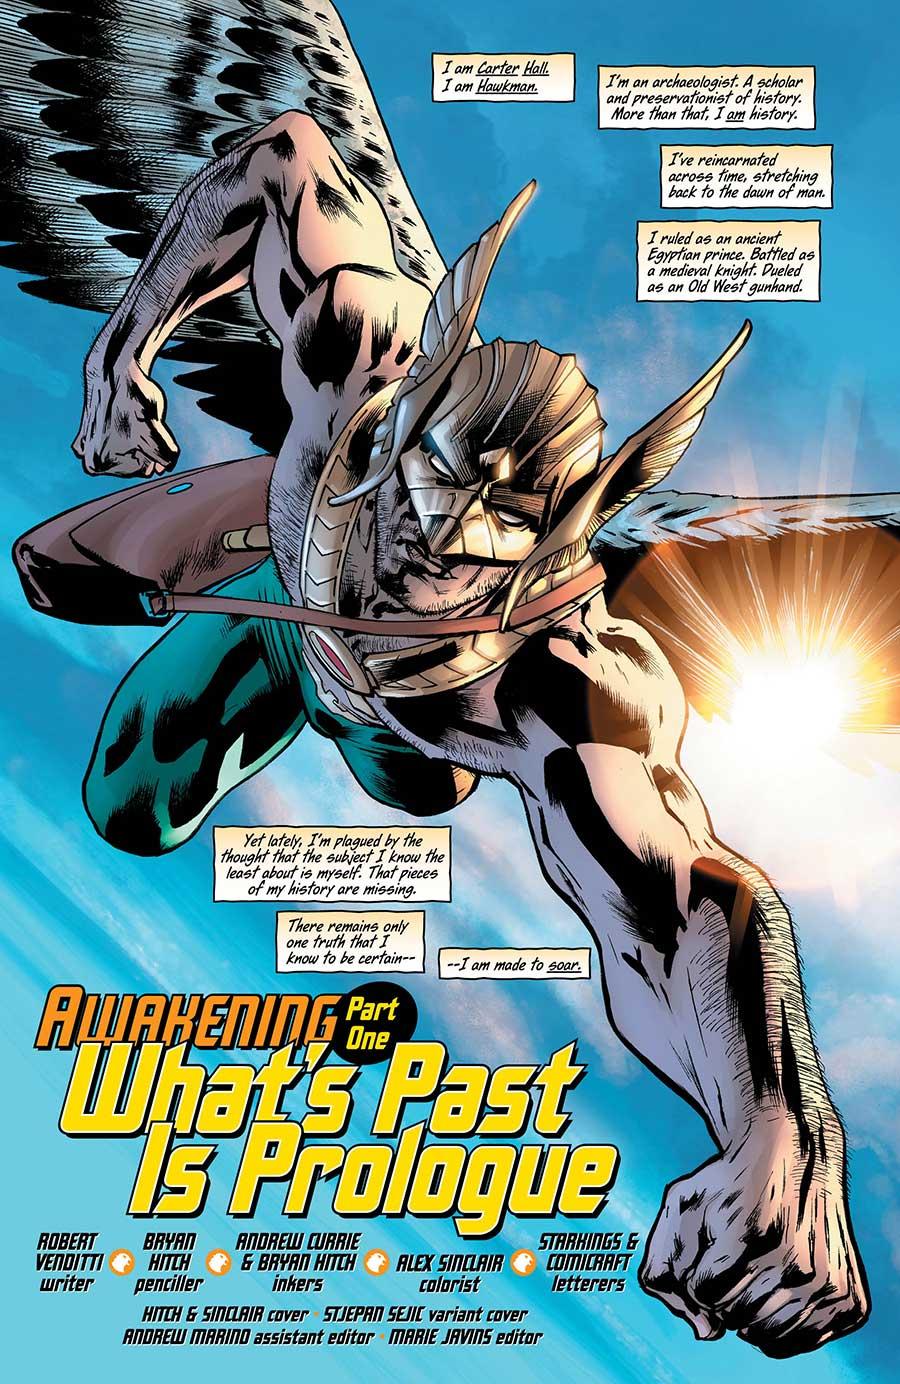 Hawkman 1 - DC Comics News